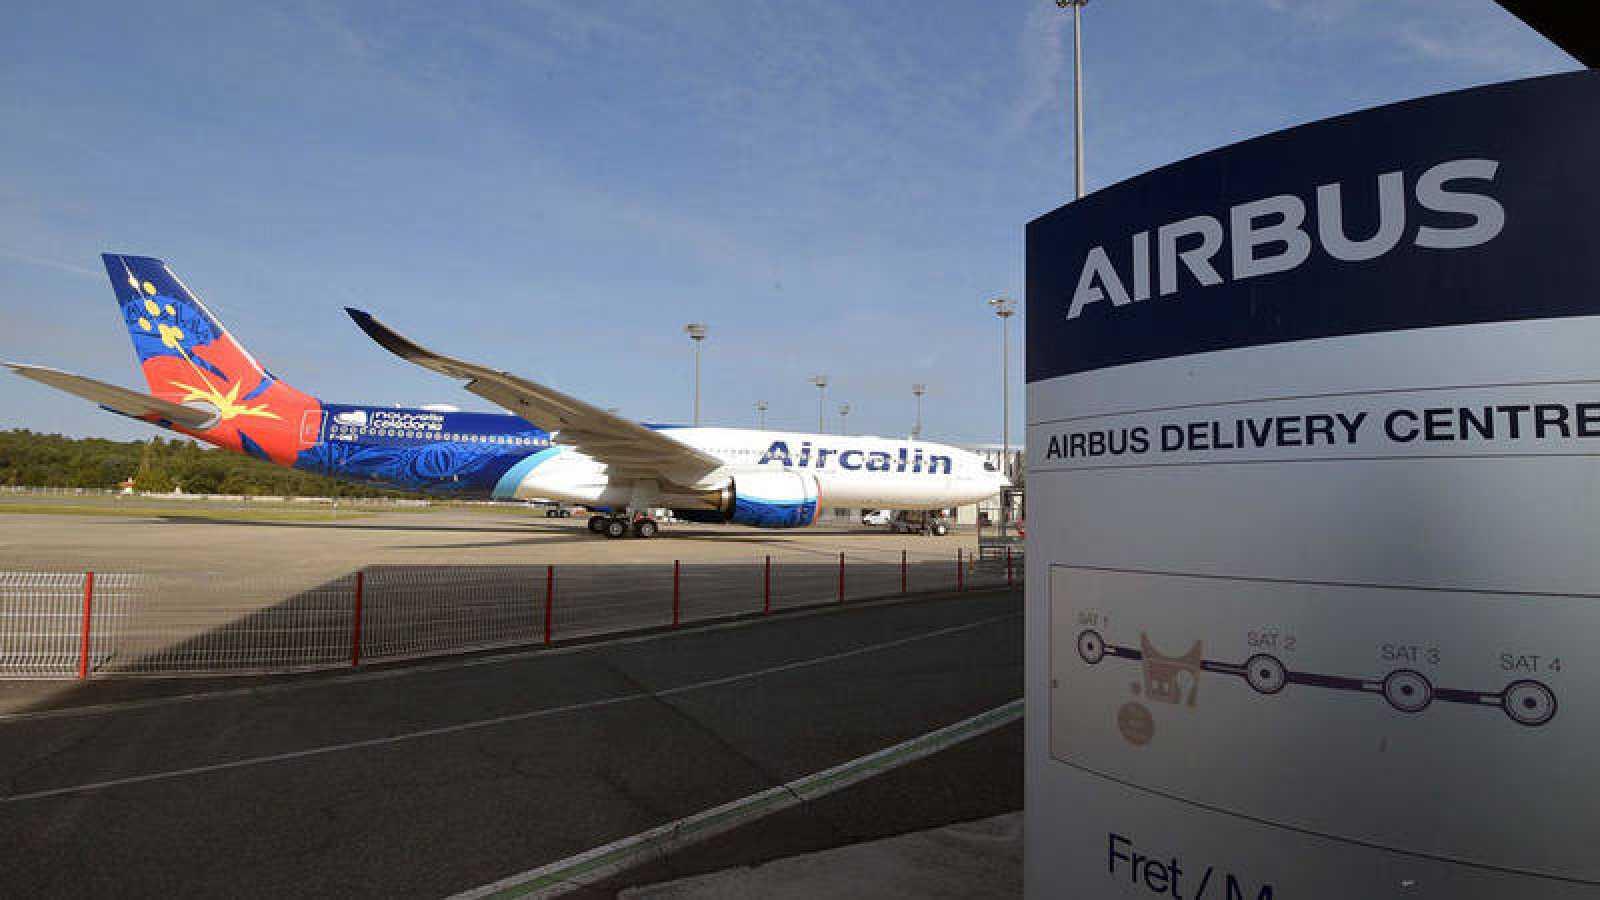 Centro de entrega de aviones Airbus enColomiers, Francia.PASCAL PAVANI / AFP